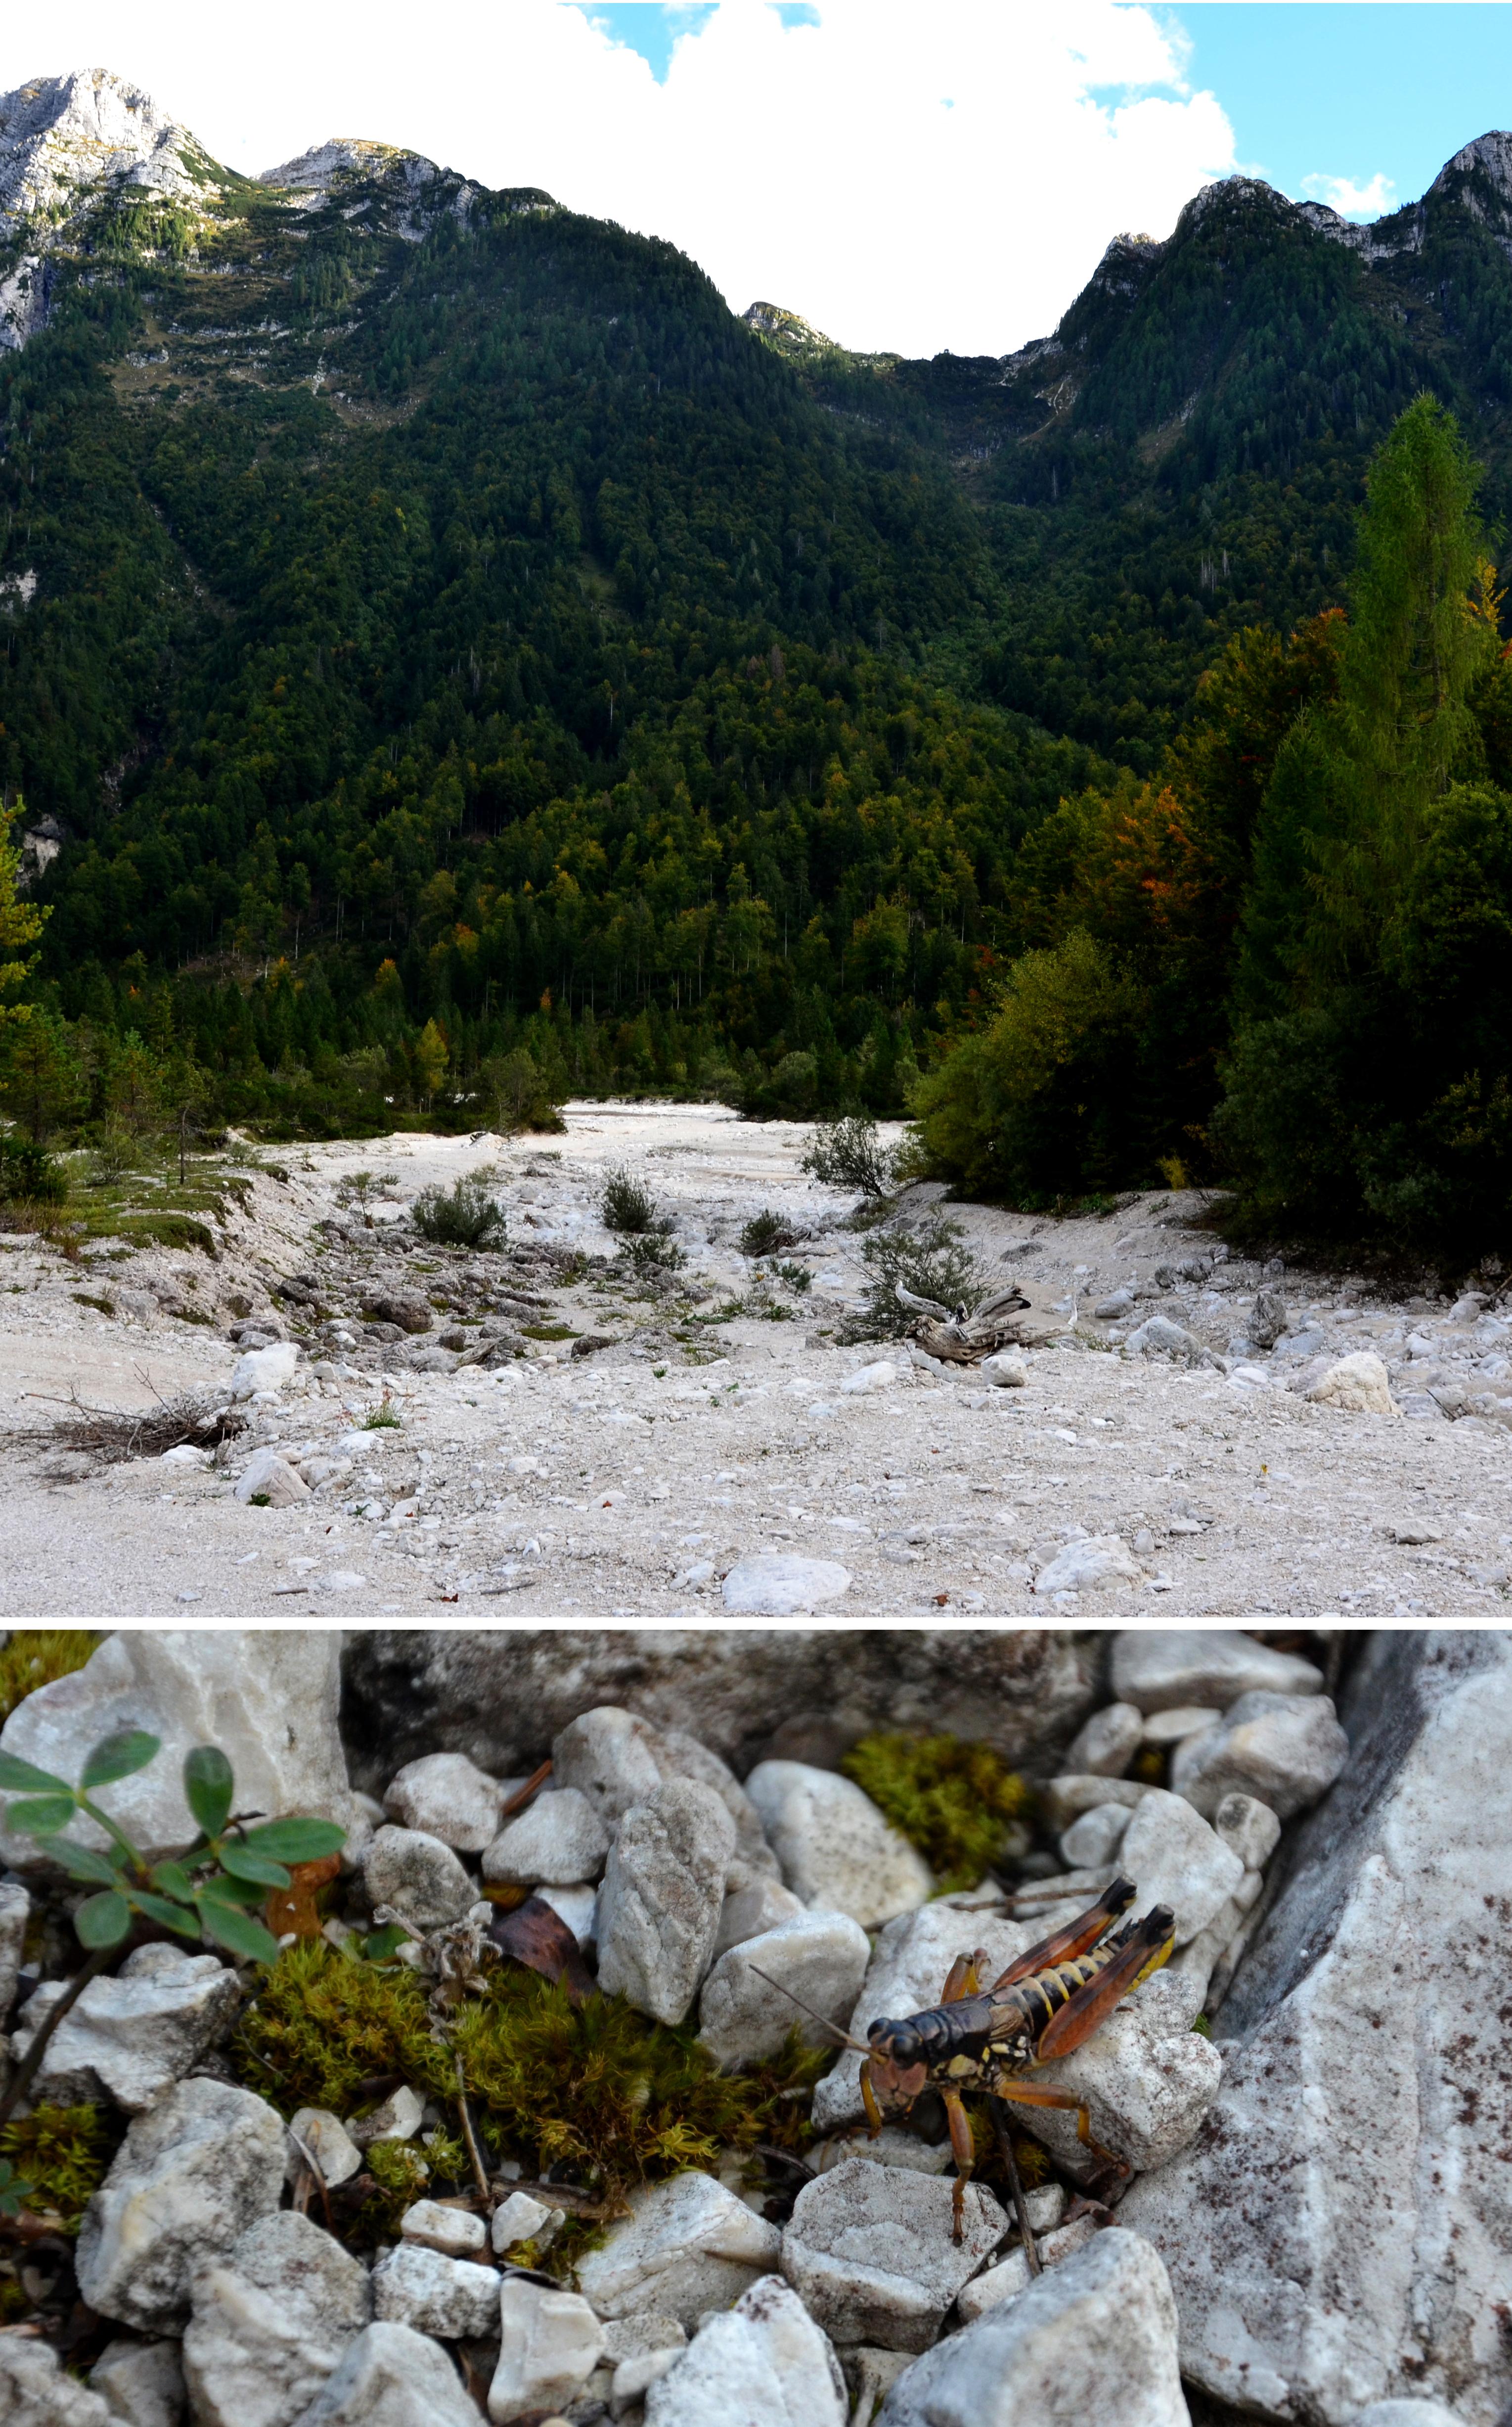 Štěrkoviště horského toku Rio Lago (1 000 m n. m.) (provincie Udine, Itálie) svýskytem saranče Podisma pedestris (Linnaeus, 1758) (Acrididae: Melanoplinae), (Foto: K.K.)